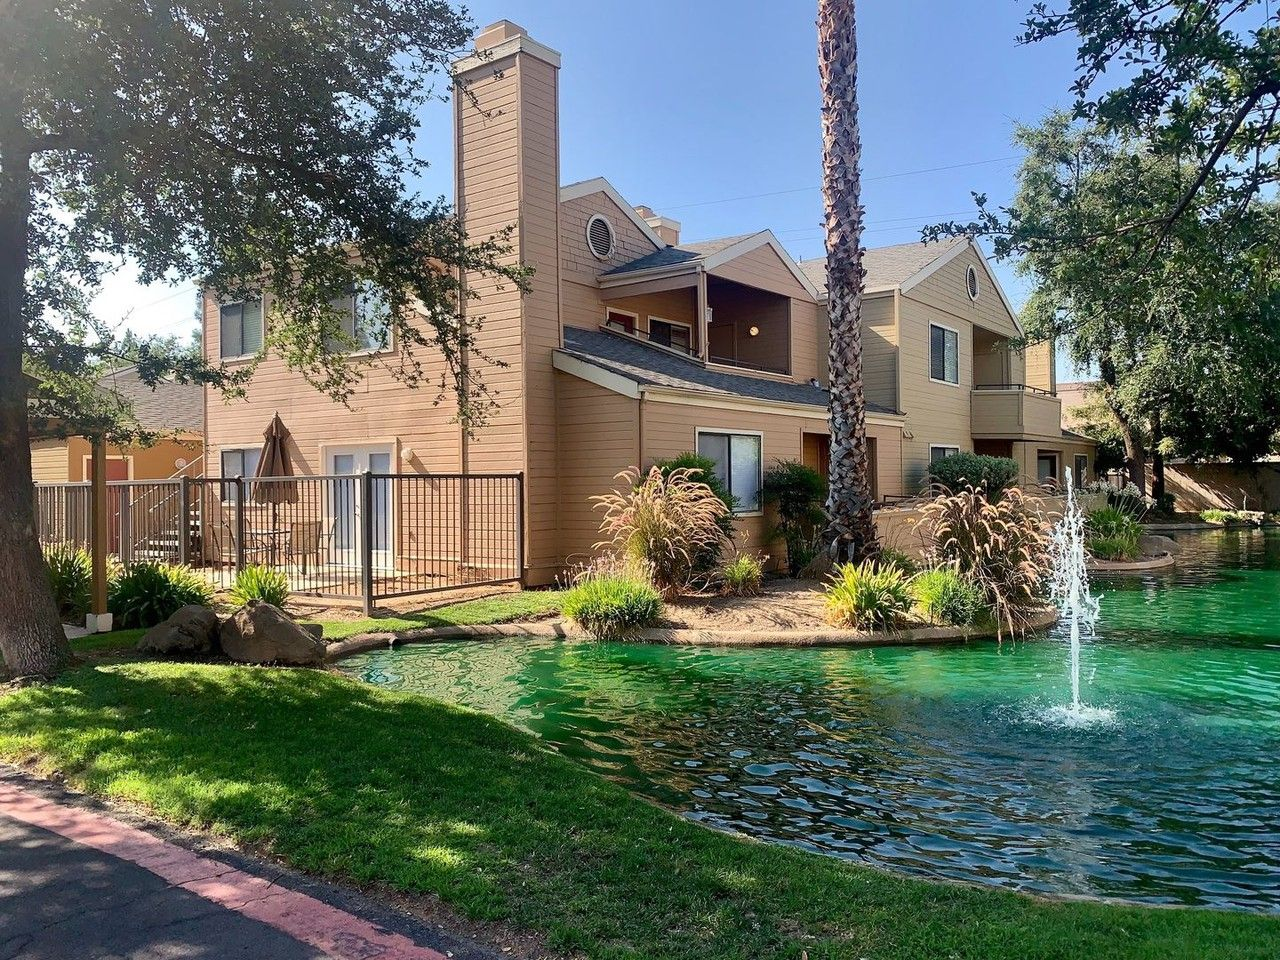 7675 N 1st St #133, Fresno, CA 93720 - 2 Bedroom Apartment ...